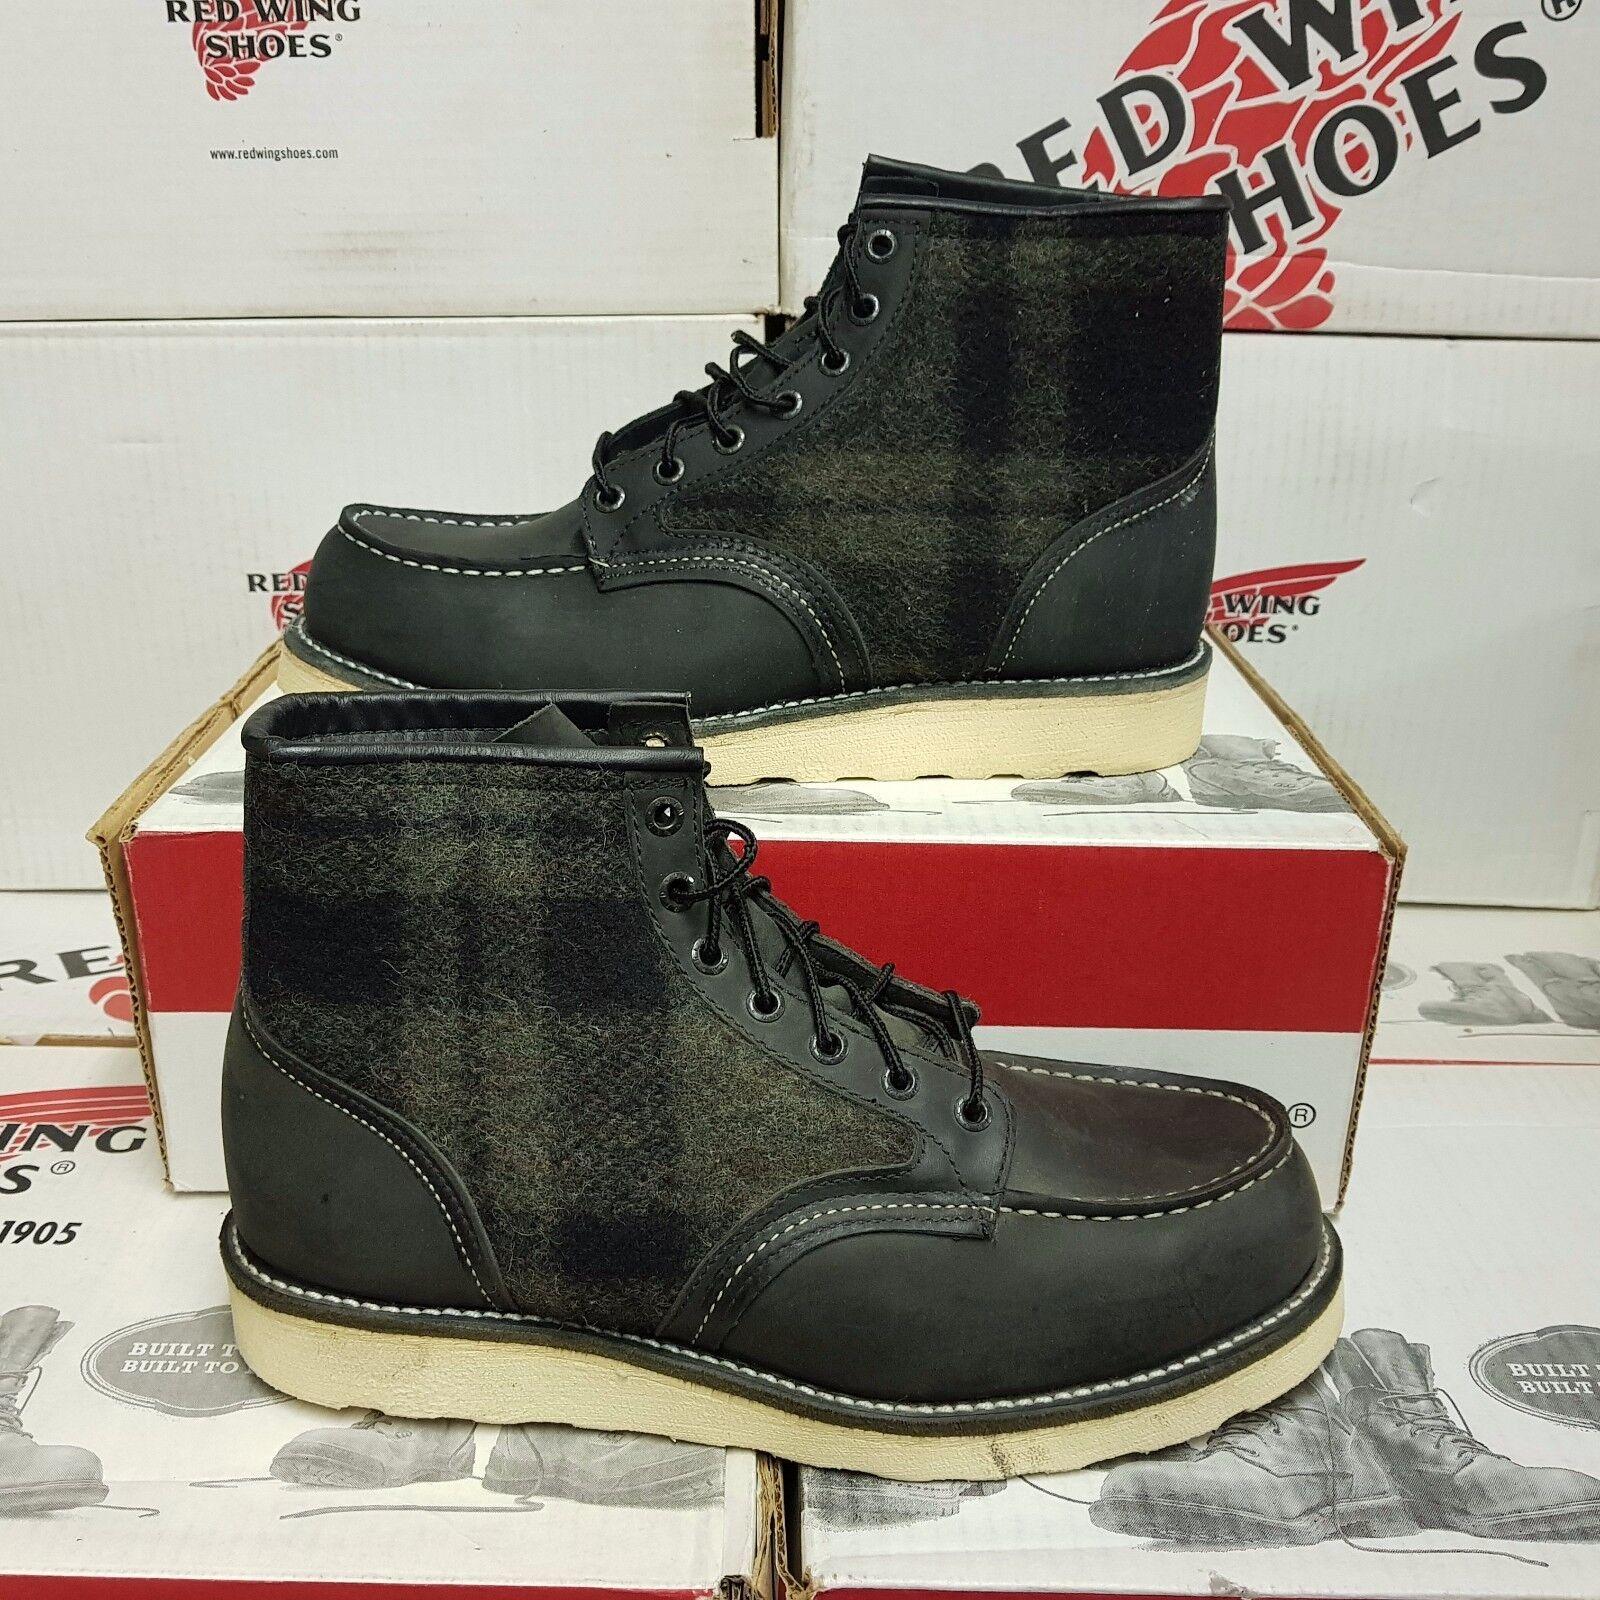 rosso WING scarpe 9002 uomo leather stivali scarpe US 9 EUR 42 (pv 379 )